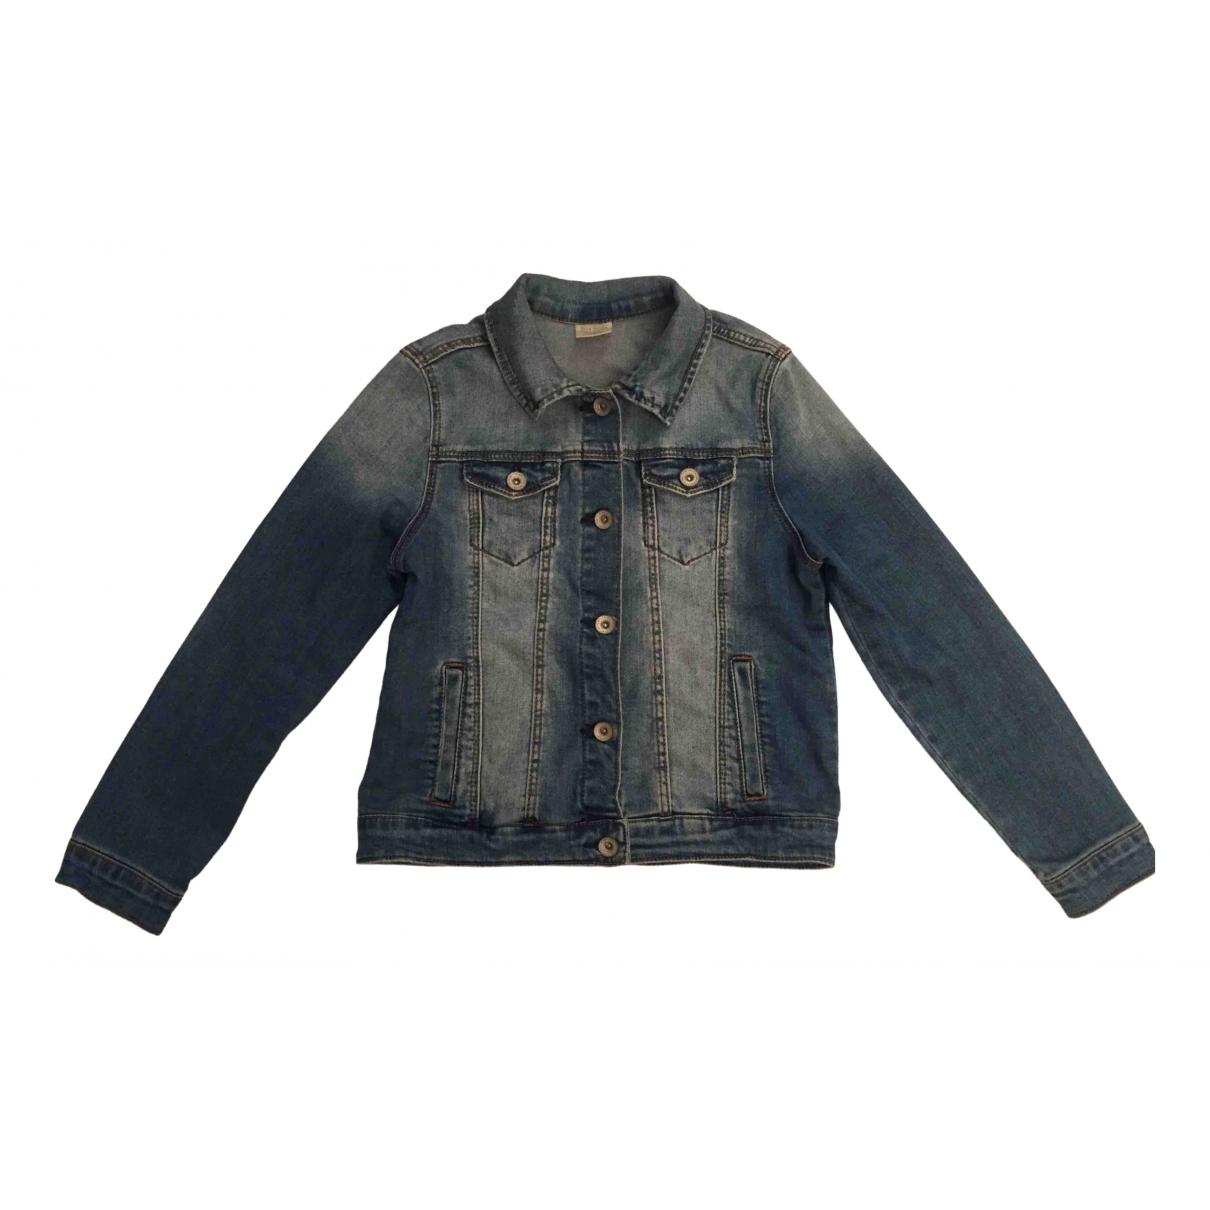 Zara - Blousons.Manteaux   pour enfant en denim